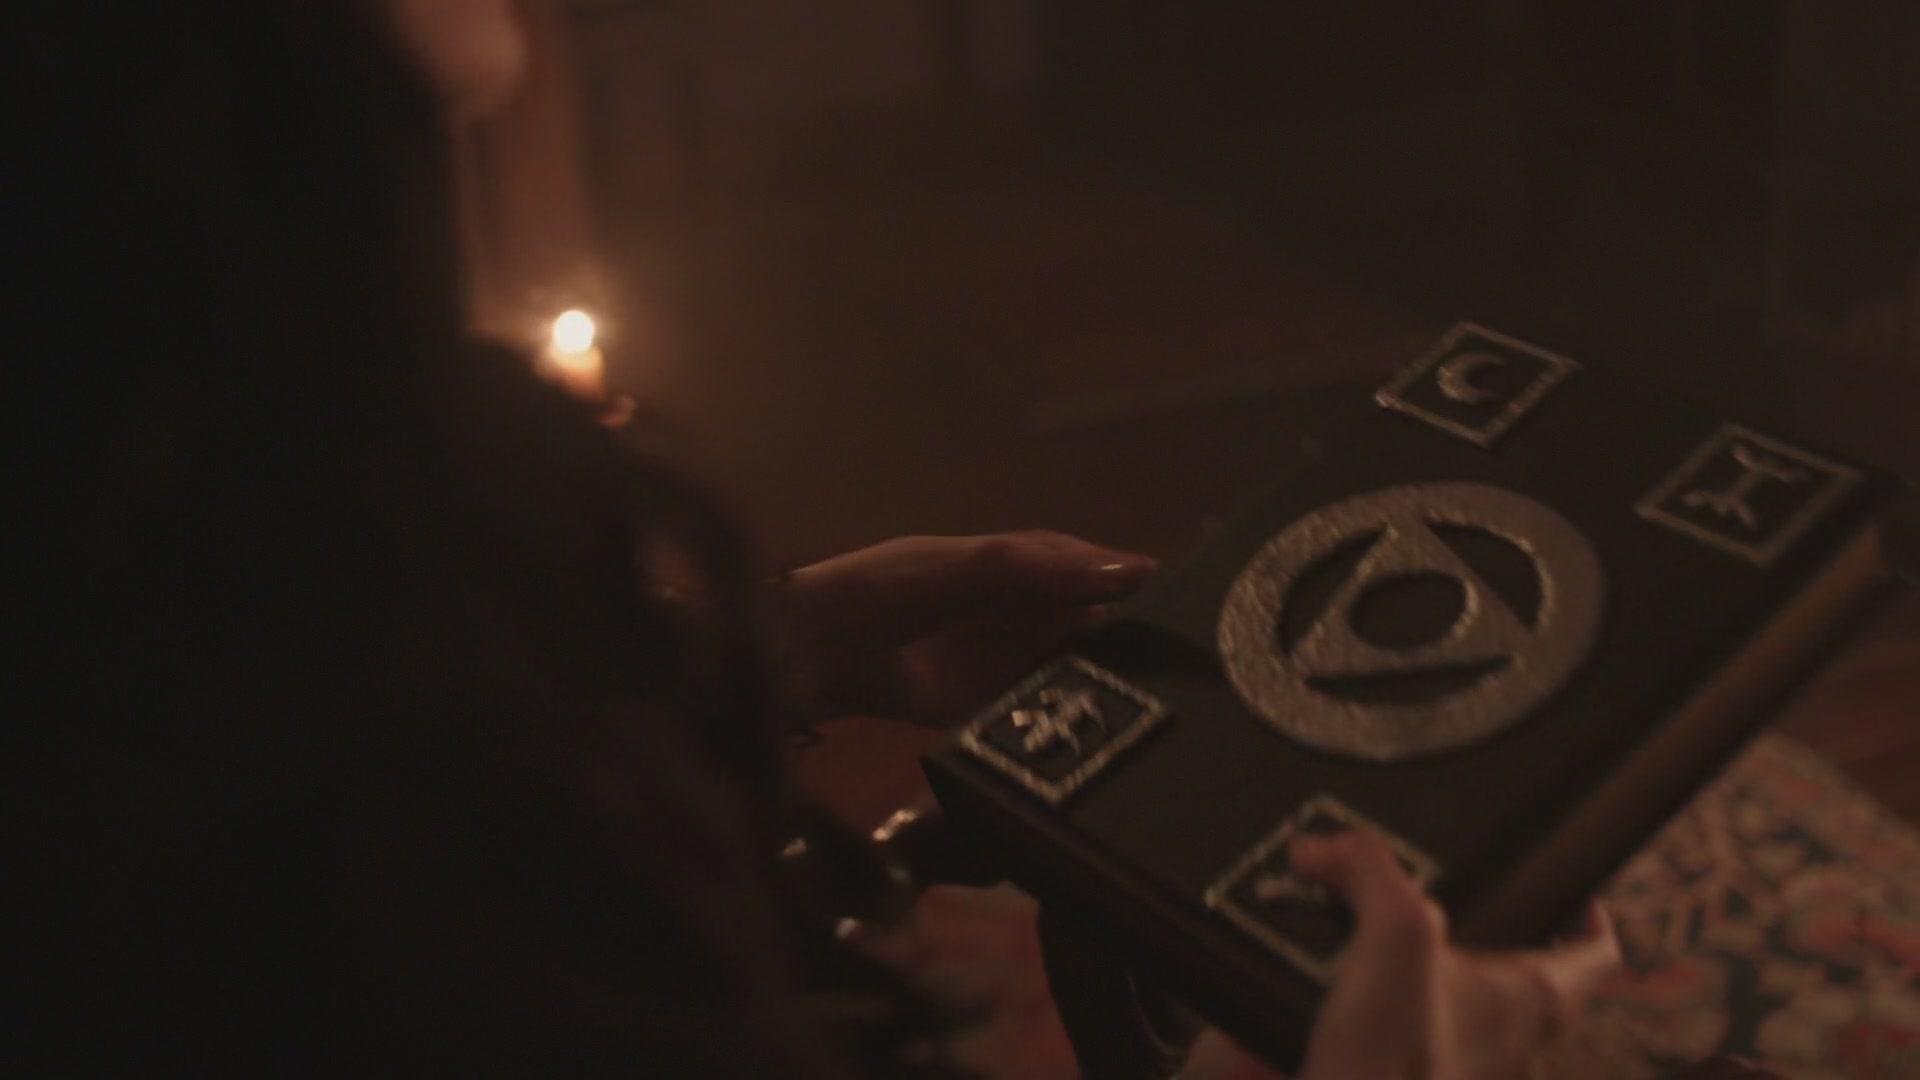 Book of Shadows (object) | The Salem Wiki | FANDOM powered